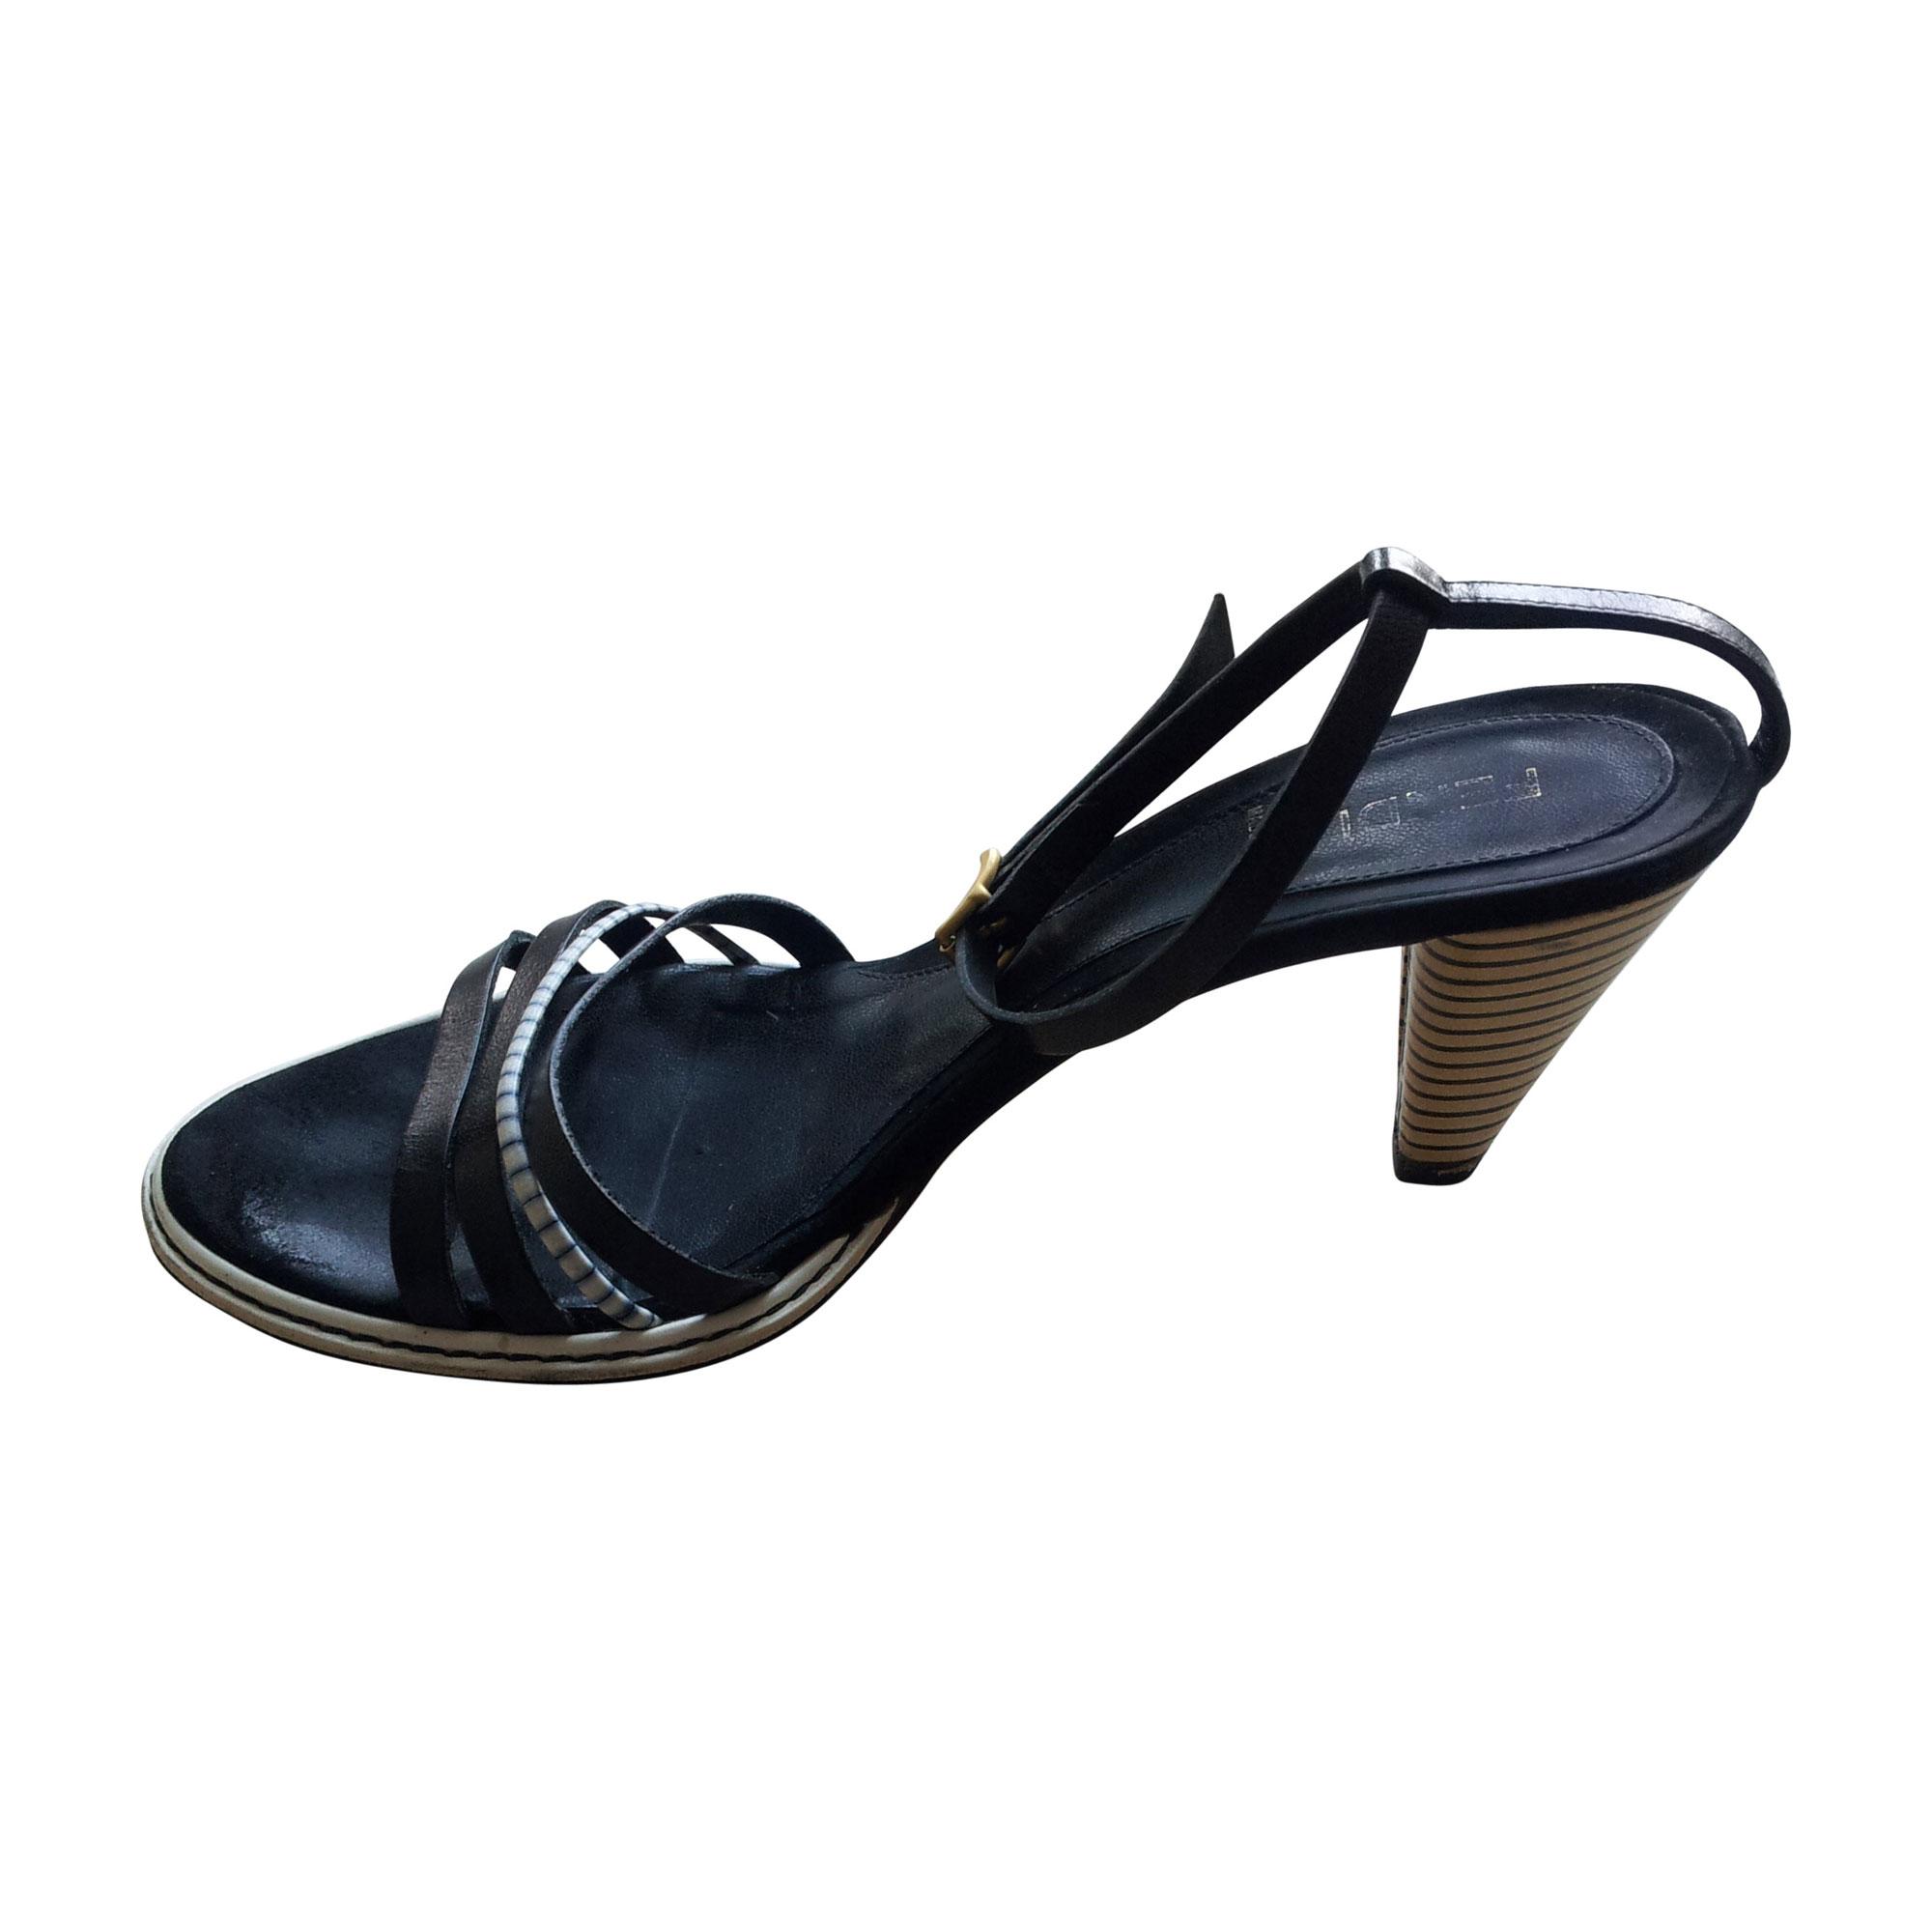 Sandales à talons FENDI Bleu, bleu marine, bleu turquoise